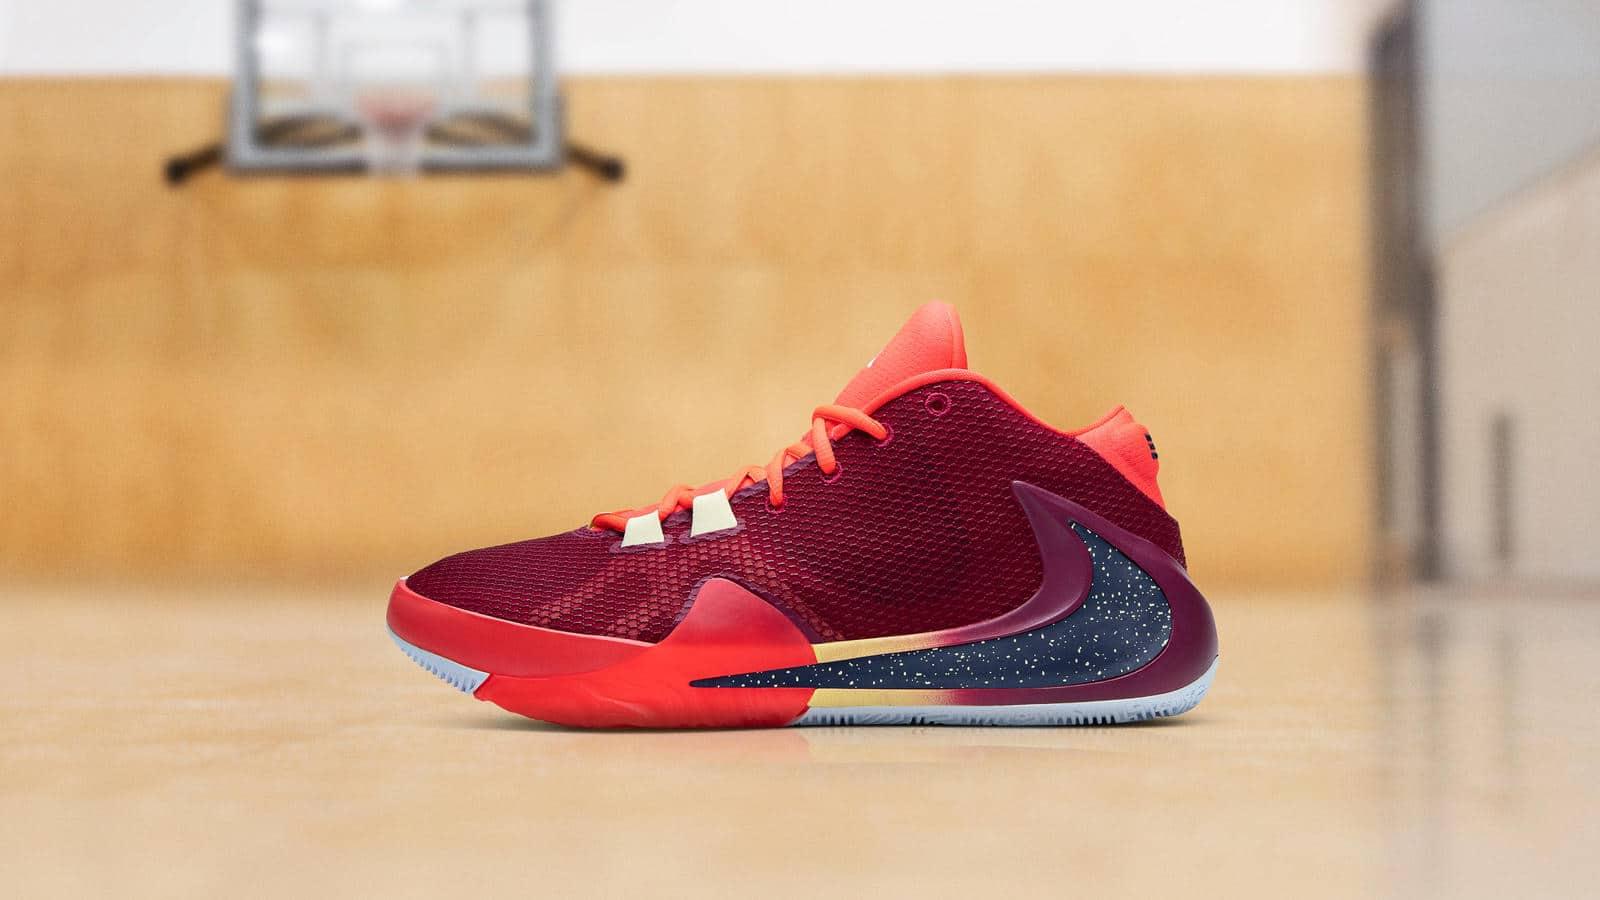 Nike-Zoom-Freak-1-All-Bros-2-Release